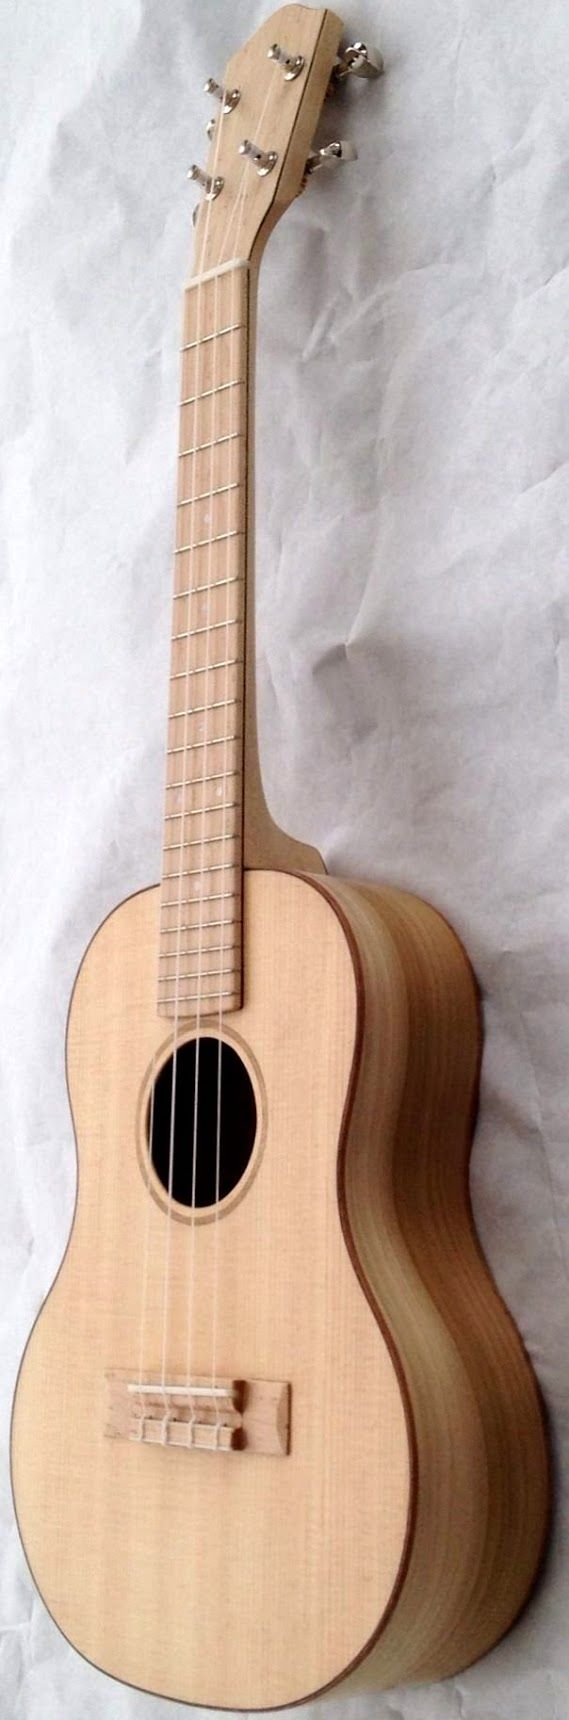 97 best ukulele images on pinterest musical instruments music lardyfatboy lardys ukulele of the day a year ago dj morgan spruce and poplar tenor fandeluxe Image collections